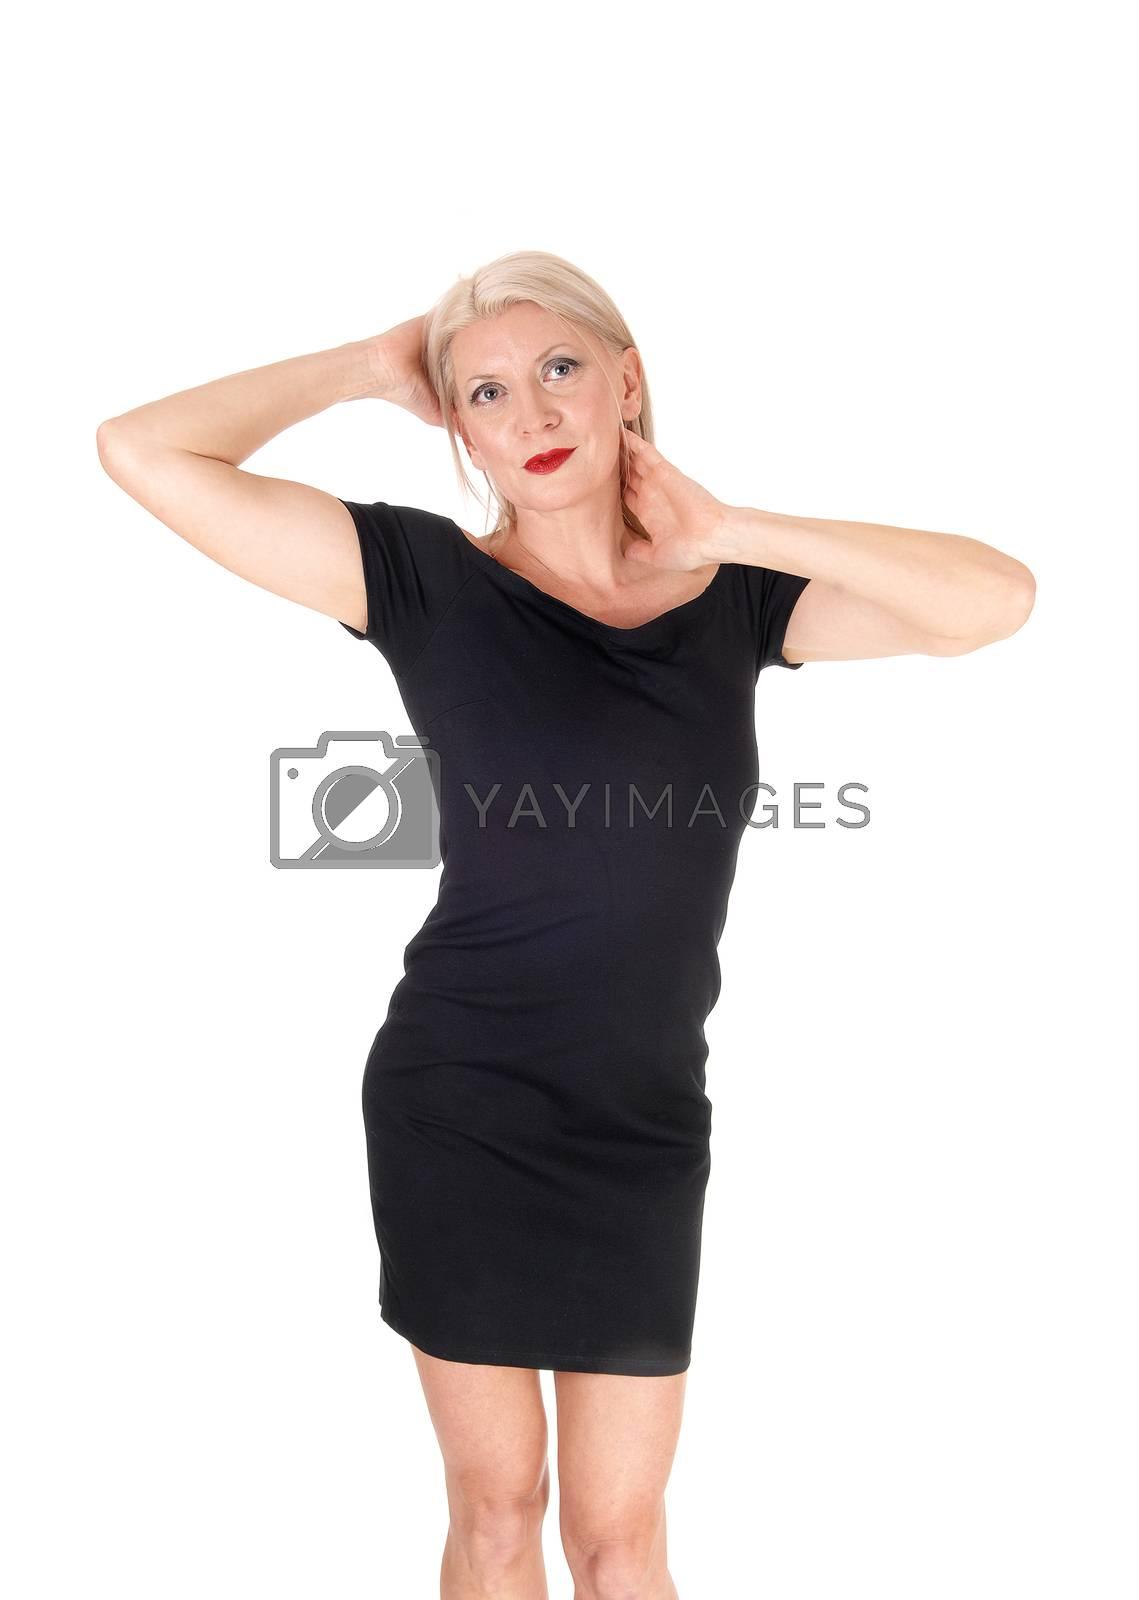 Beautiful woman standing in a short black dress hands on head by feierabend